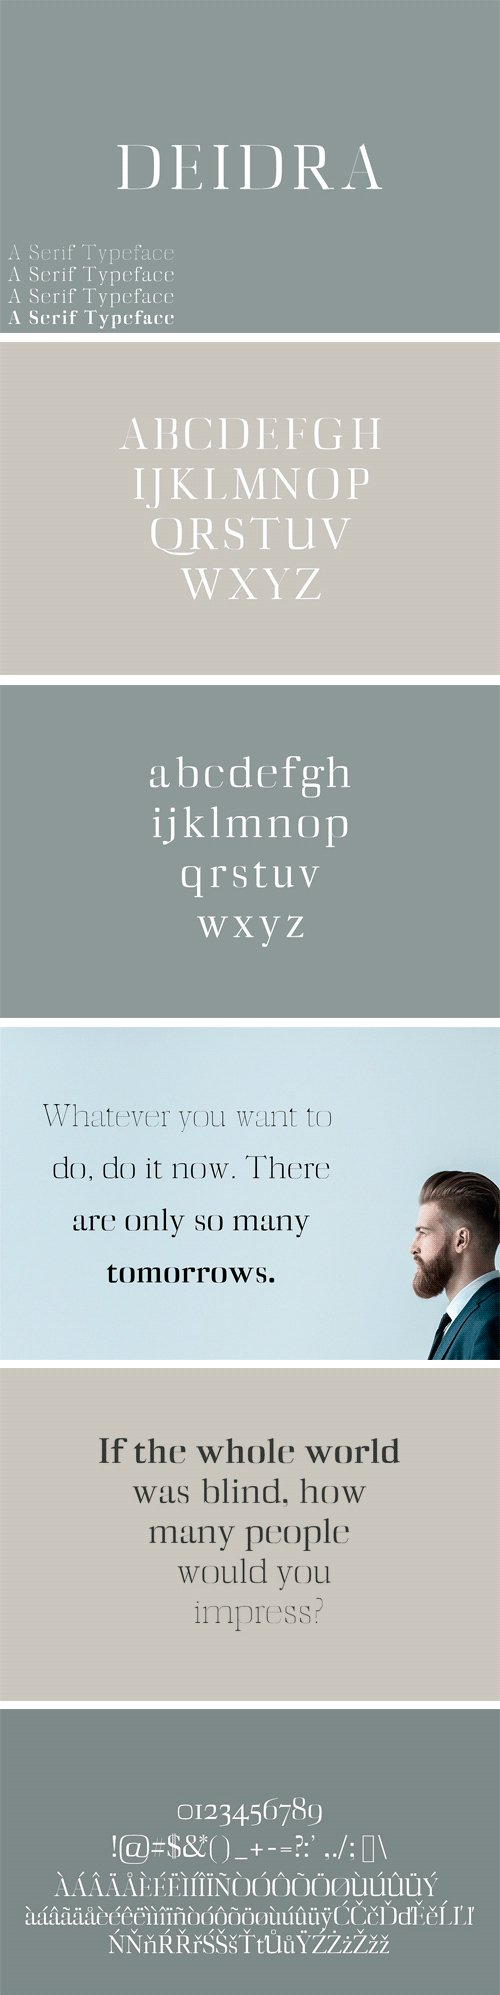 Diedra Serif Font Family Pack 1757769